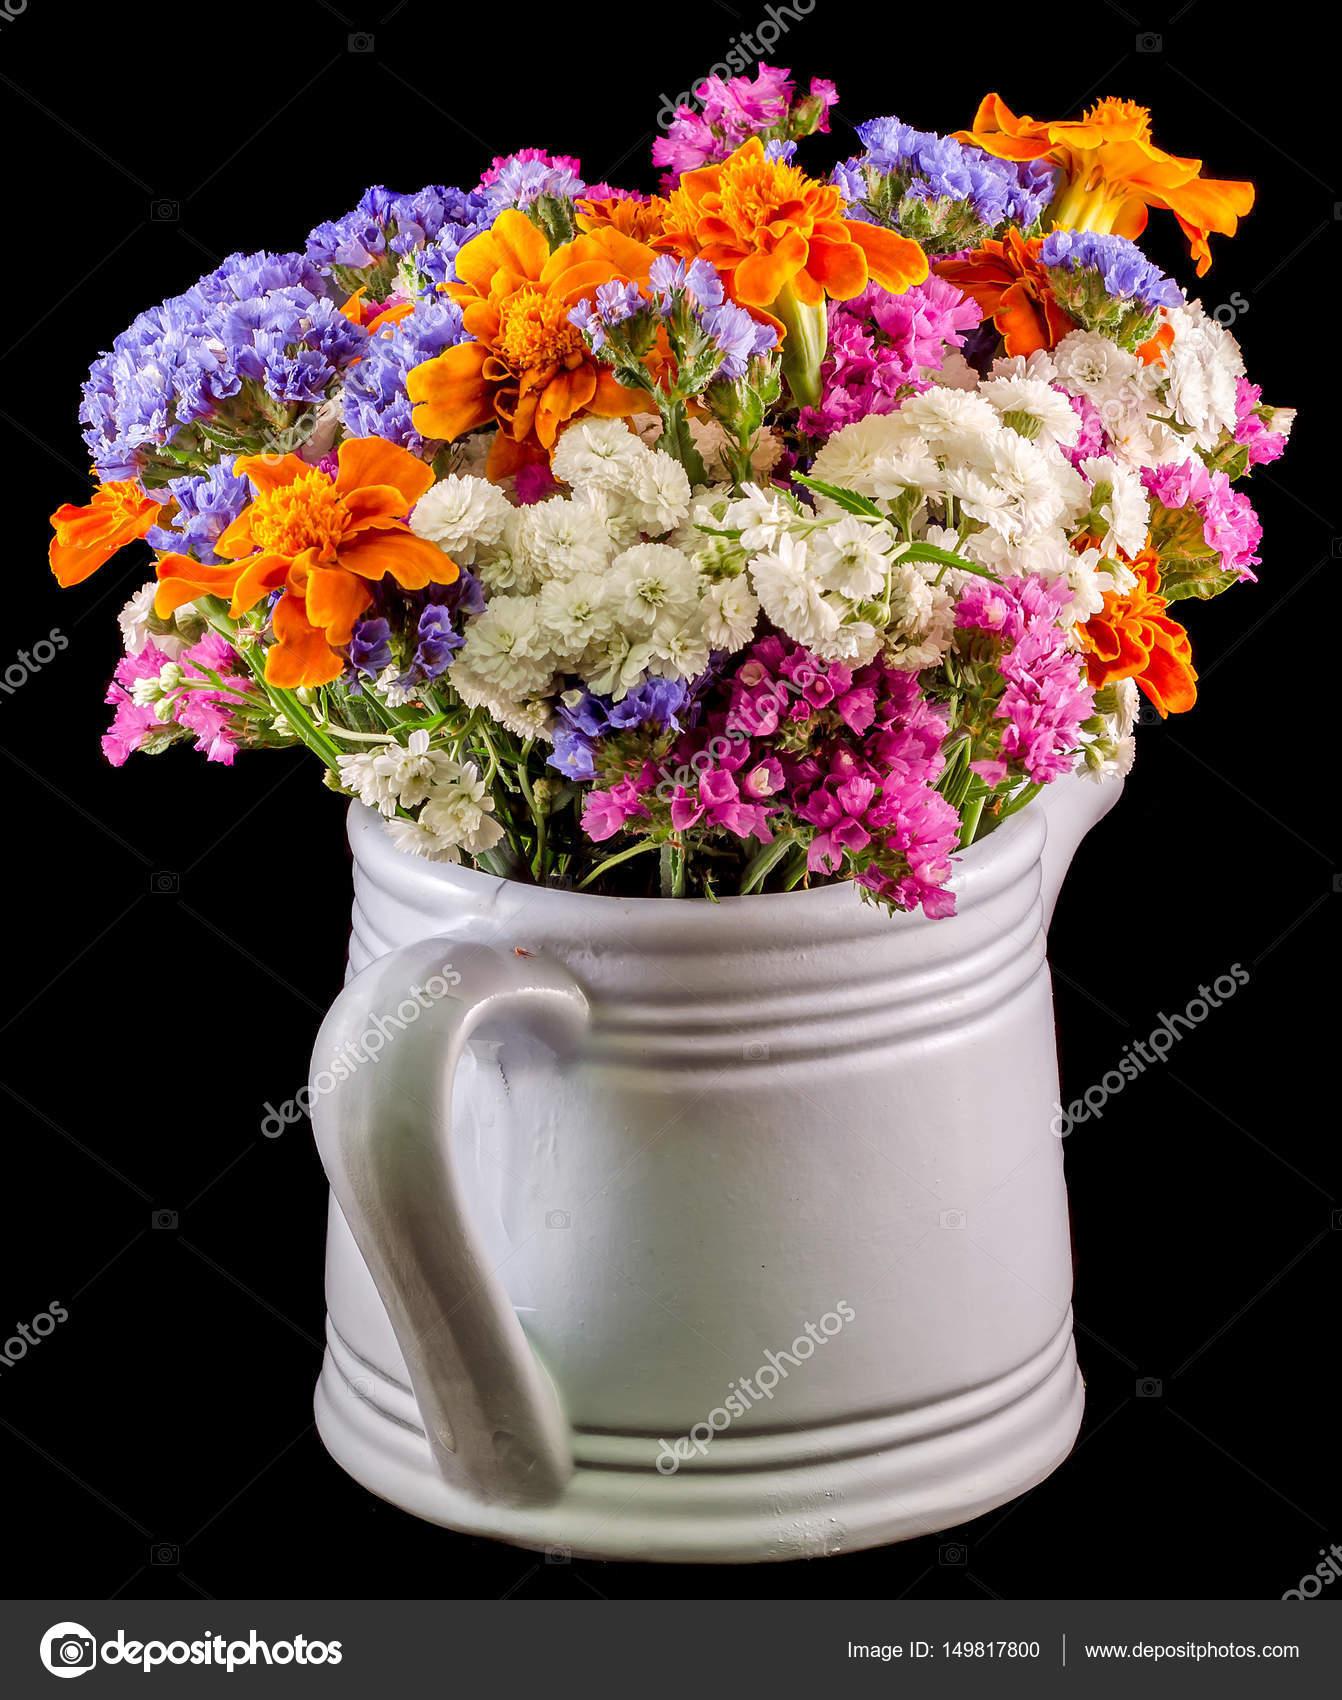 White ceramic watercan sprinkler with vivid colored flowers white ceramic watercan sprinkler with vivid colored flowers stock photo mightylinksfo